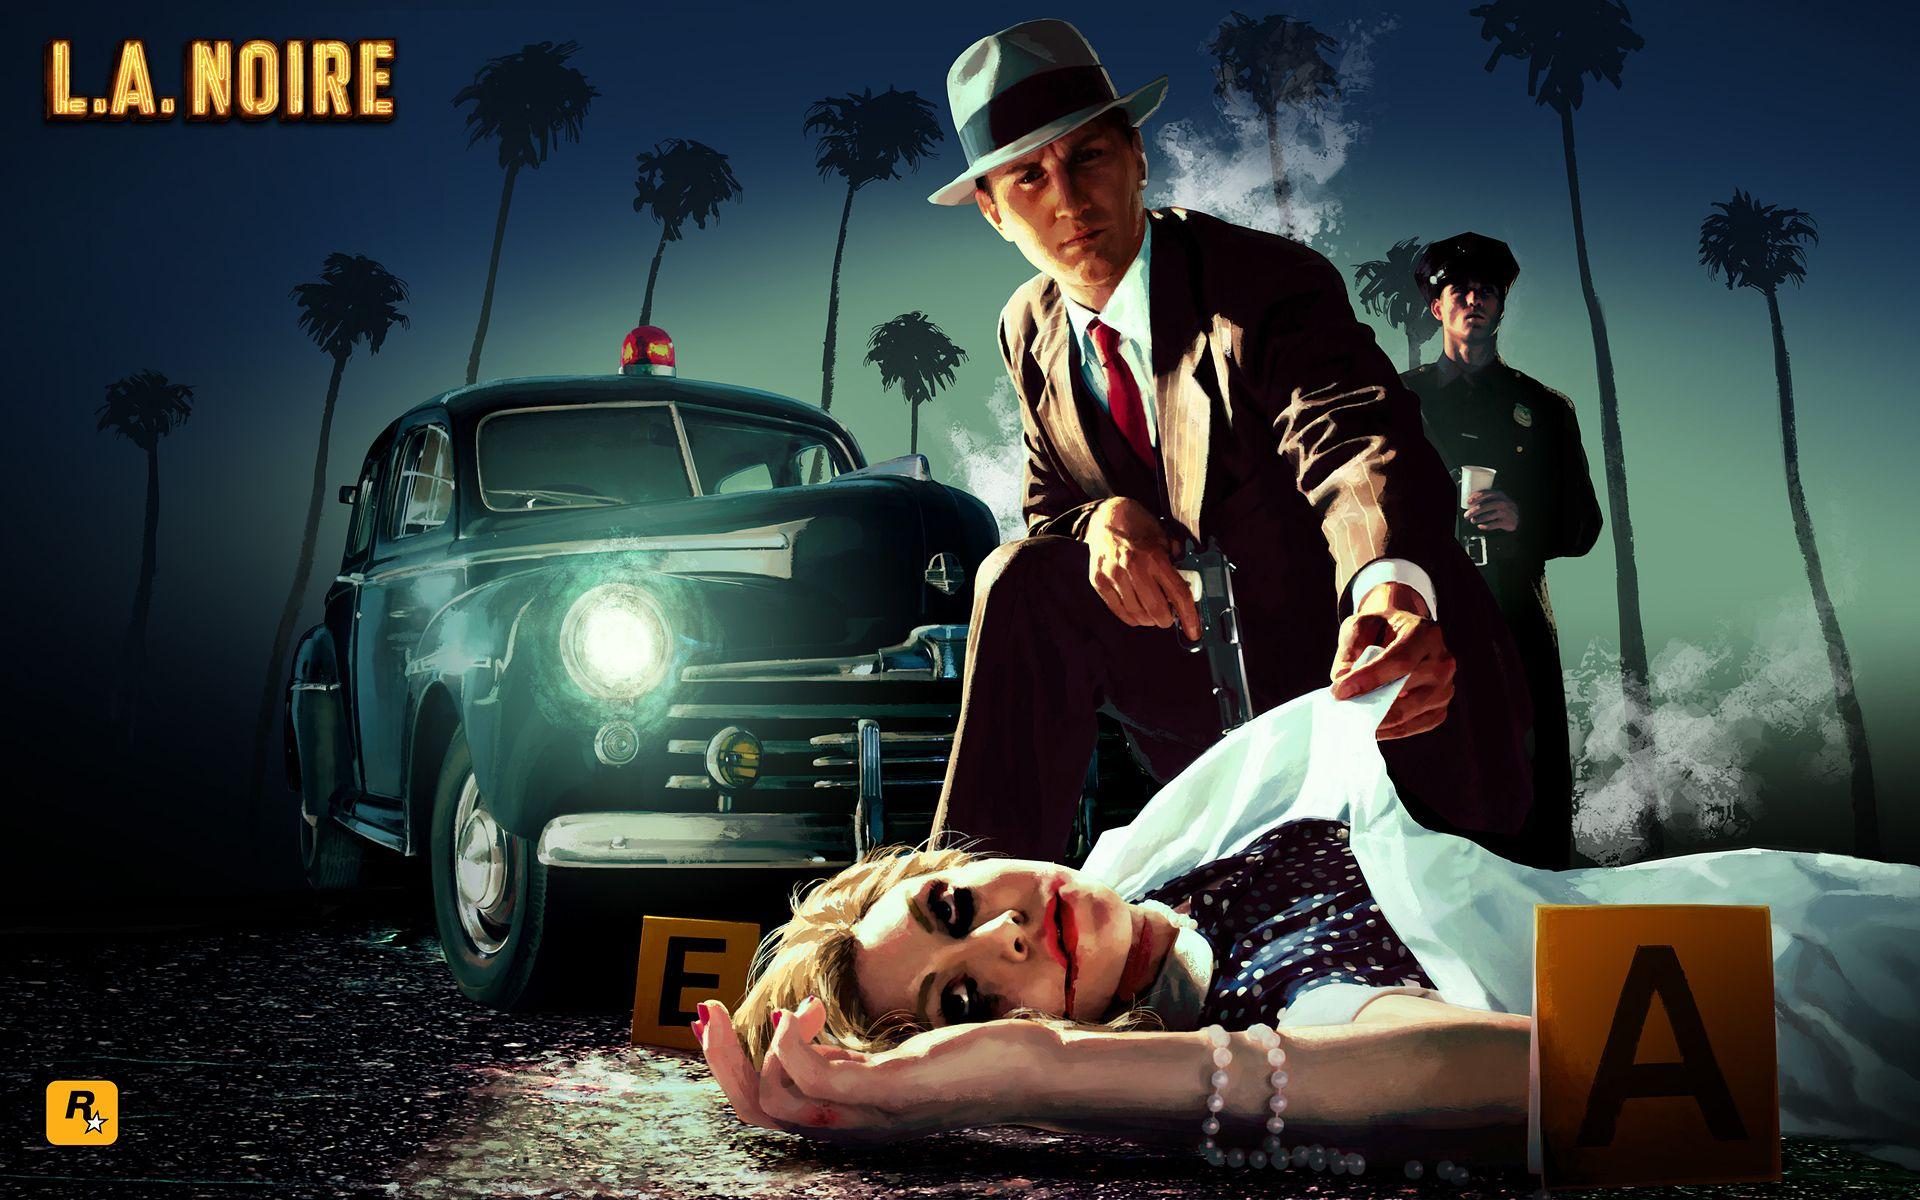 Top 5 Games Like L.A. Noire